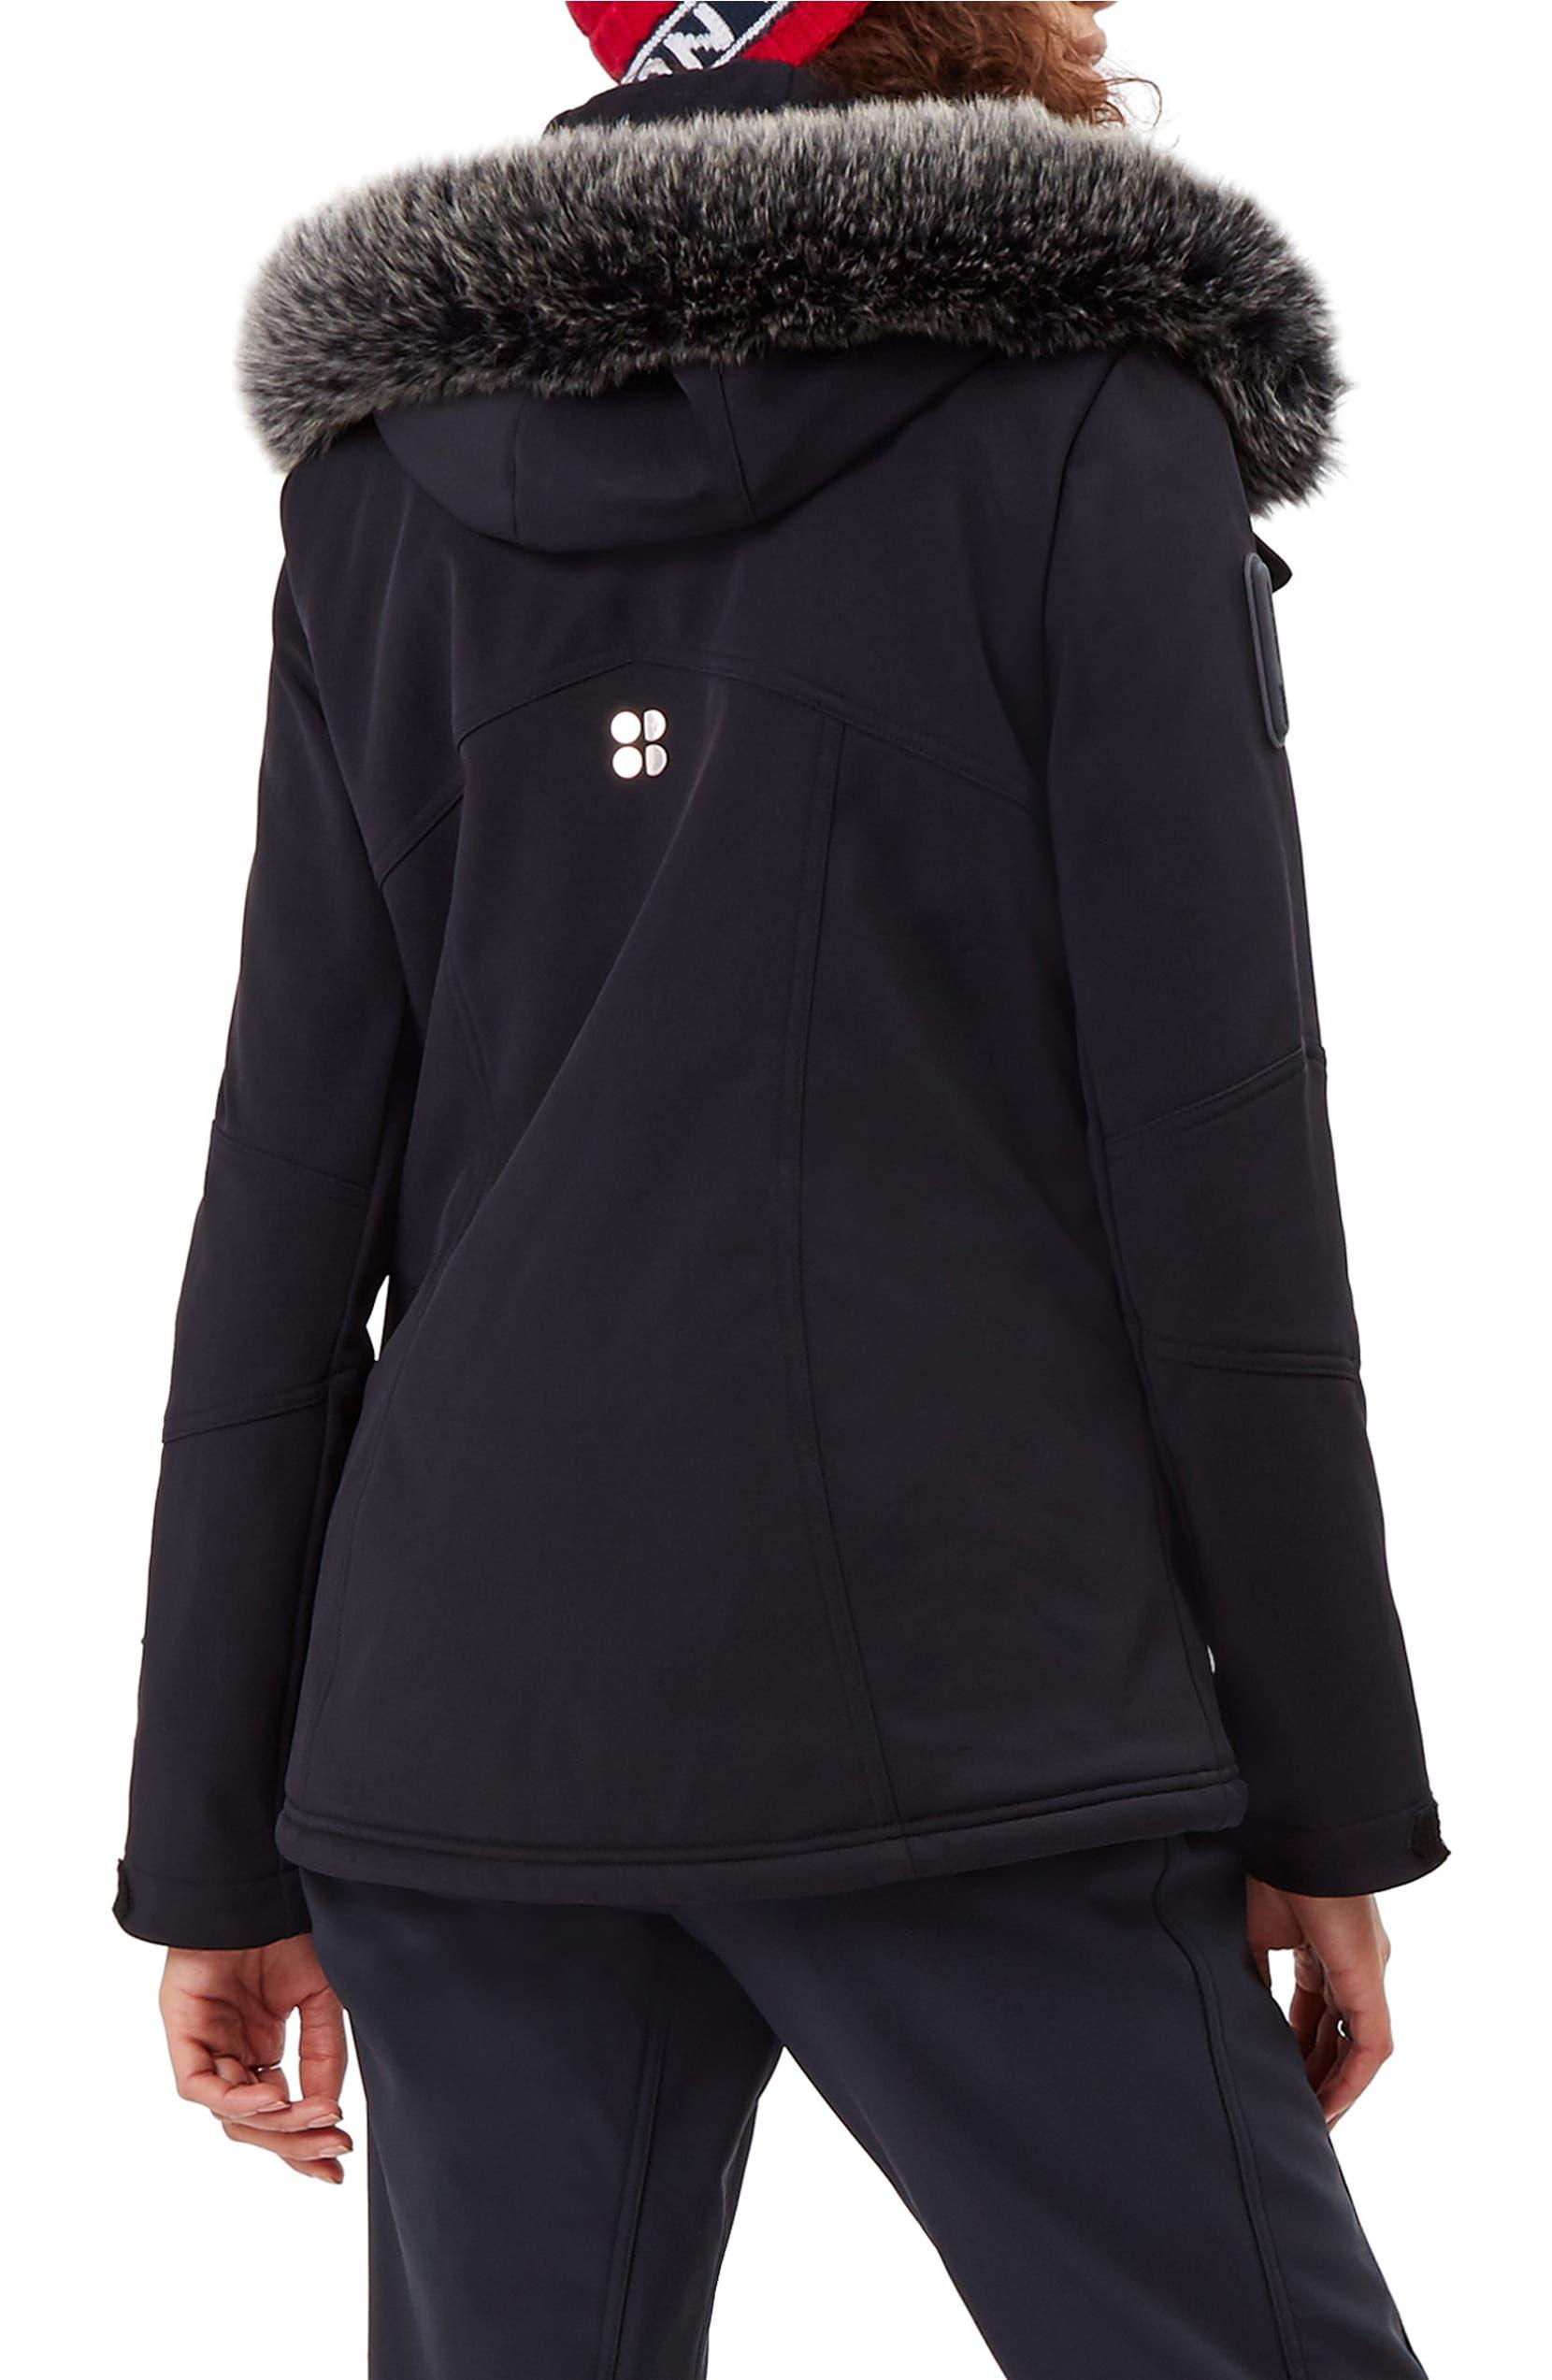 11a95433246 Sweaty Betty Exploration Soft Shell Ski Jacket with Faux Fur Trim ...